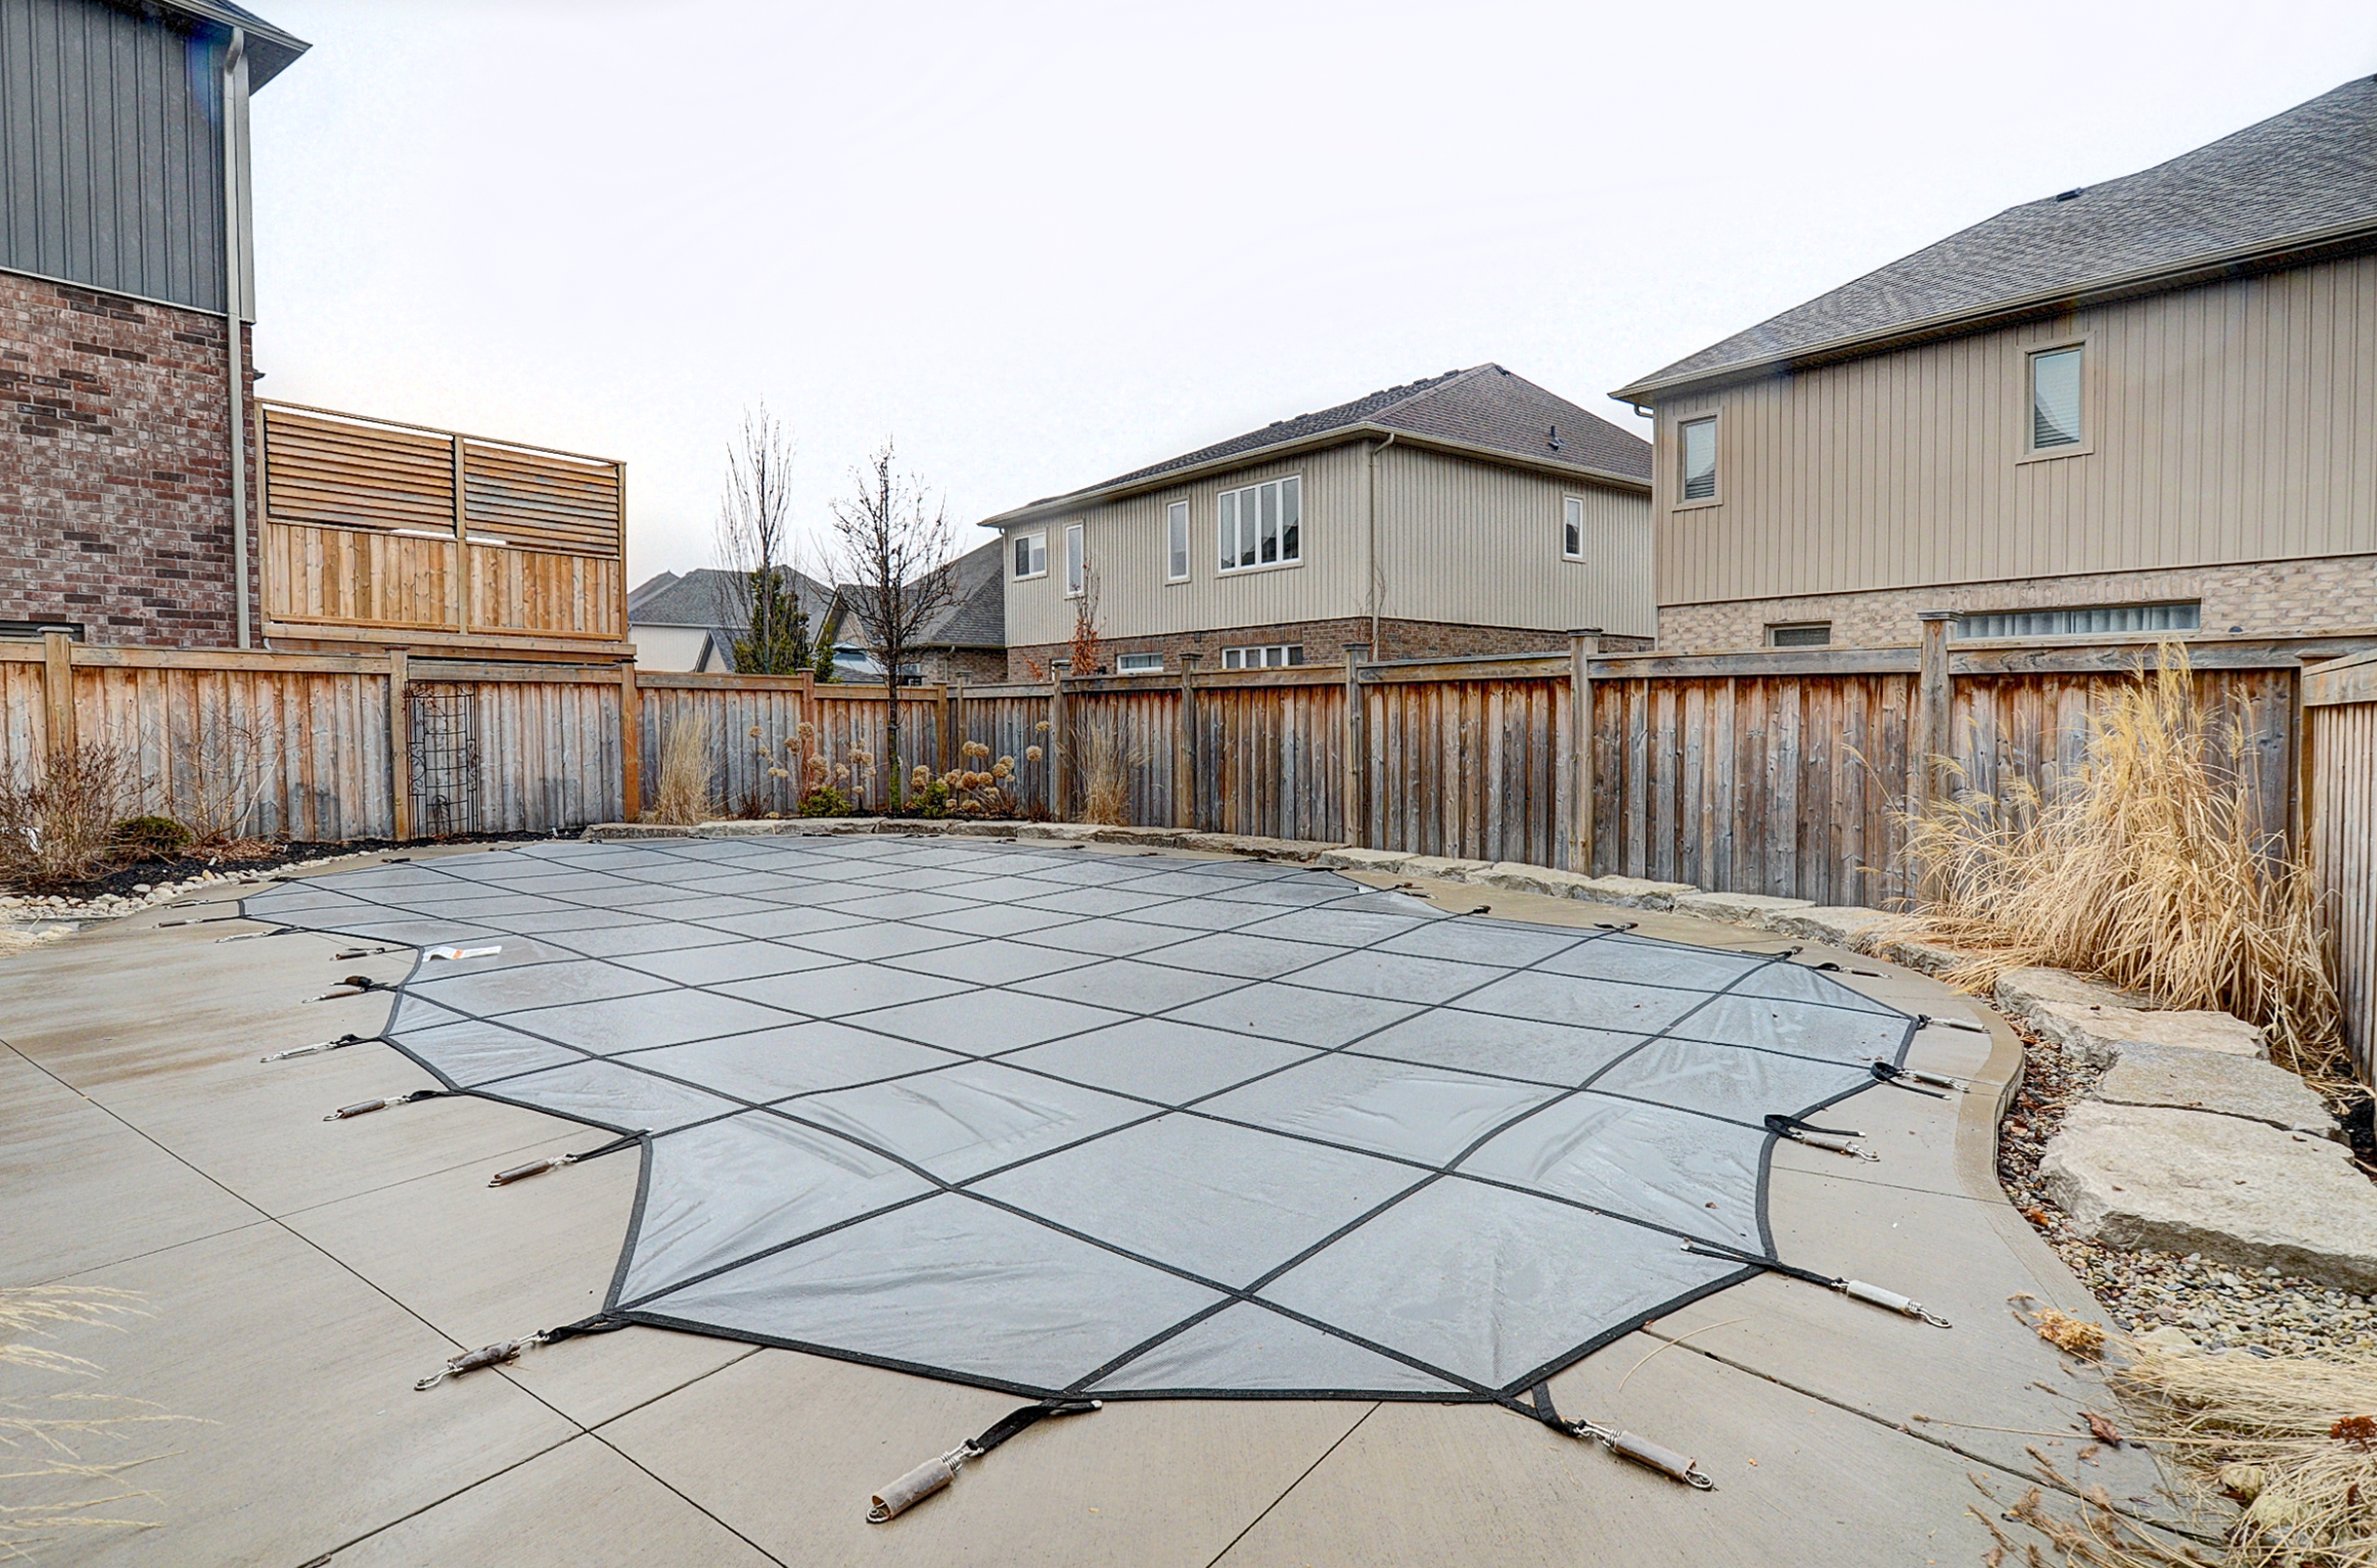 105  Back yard